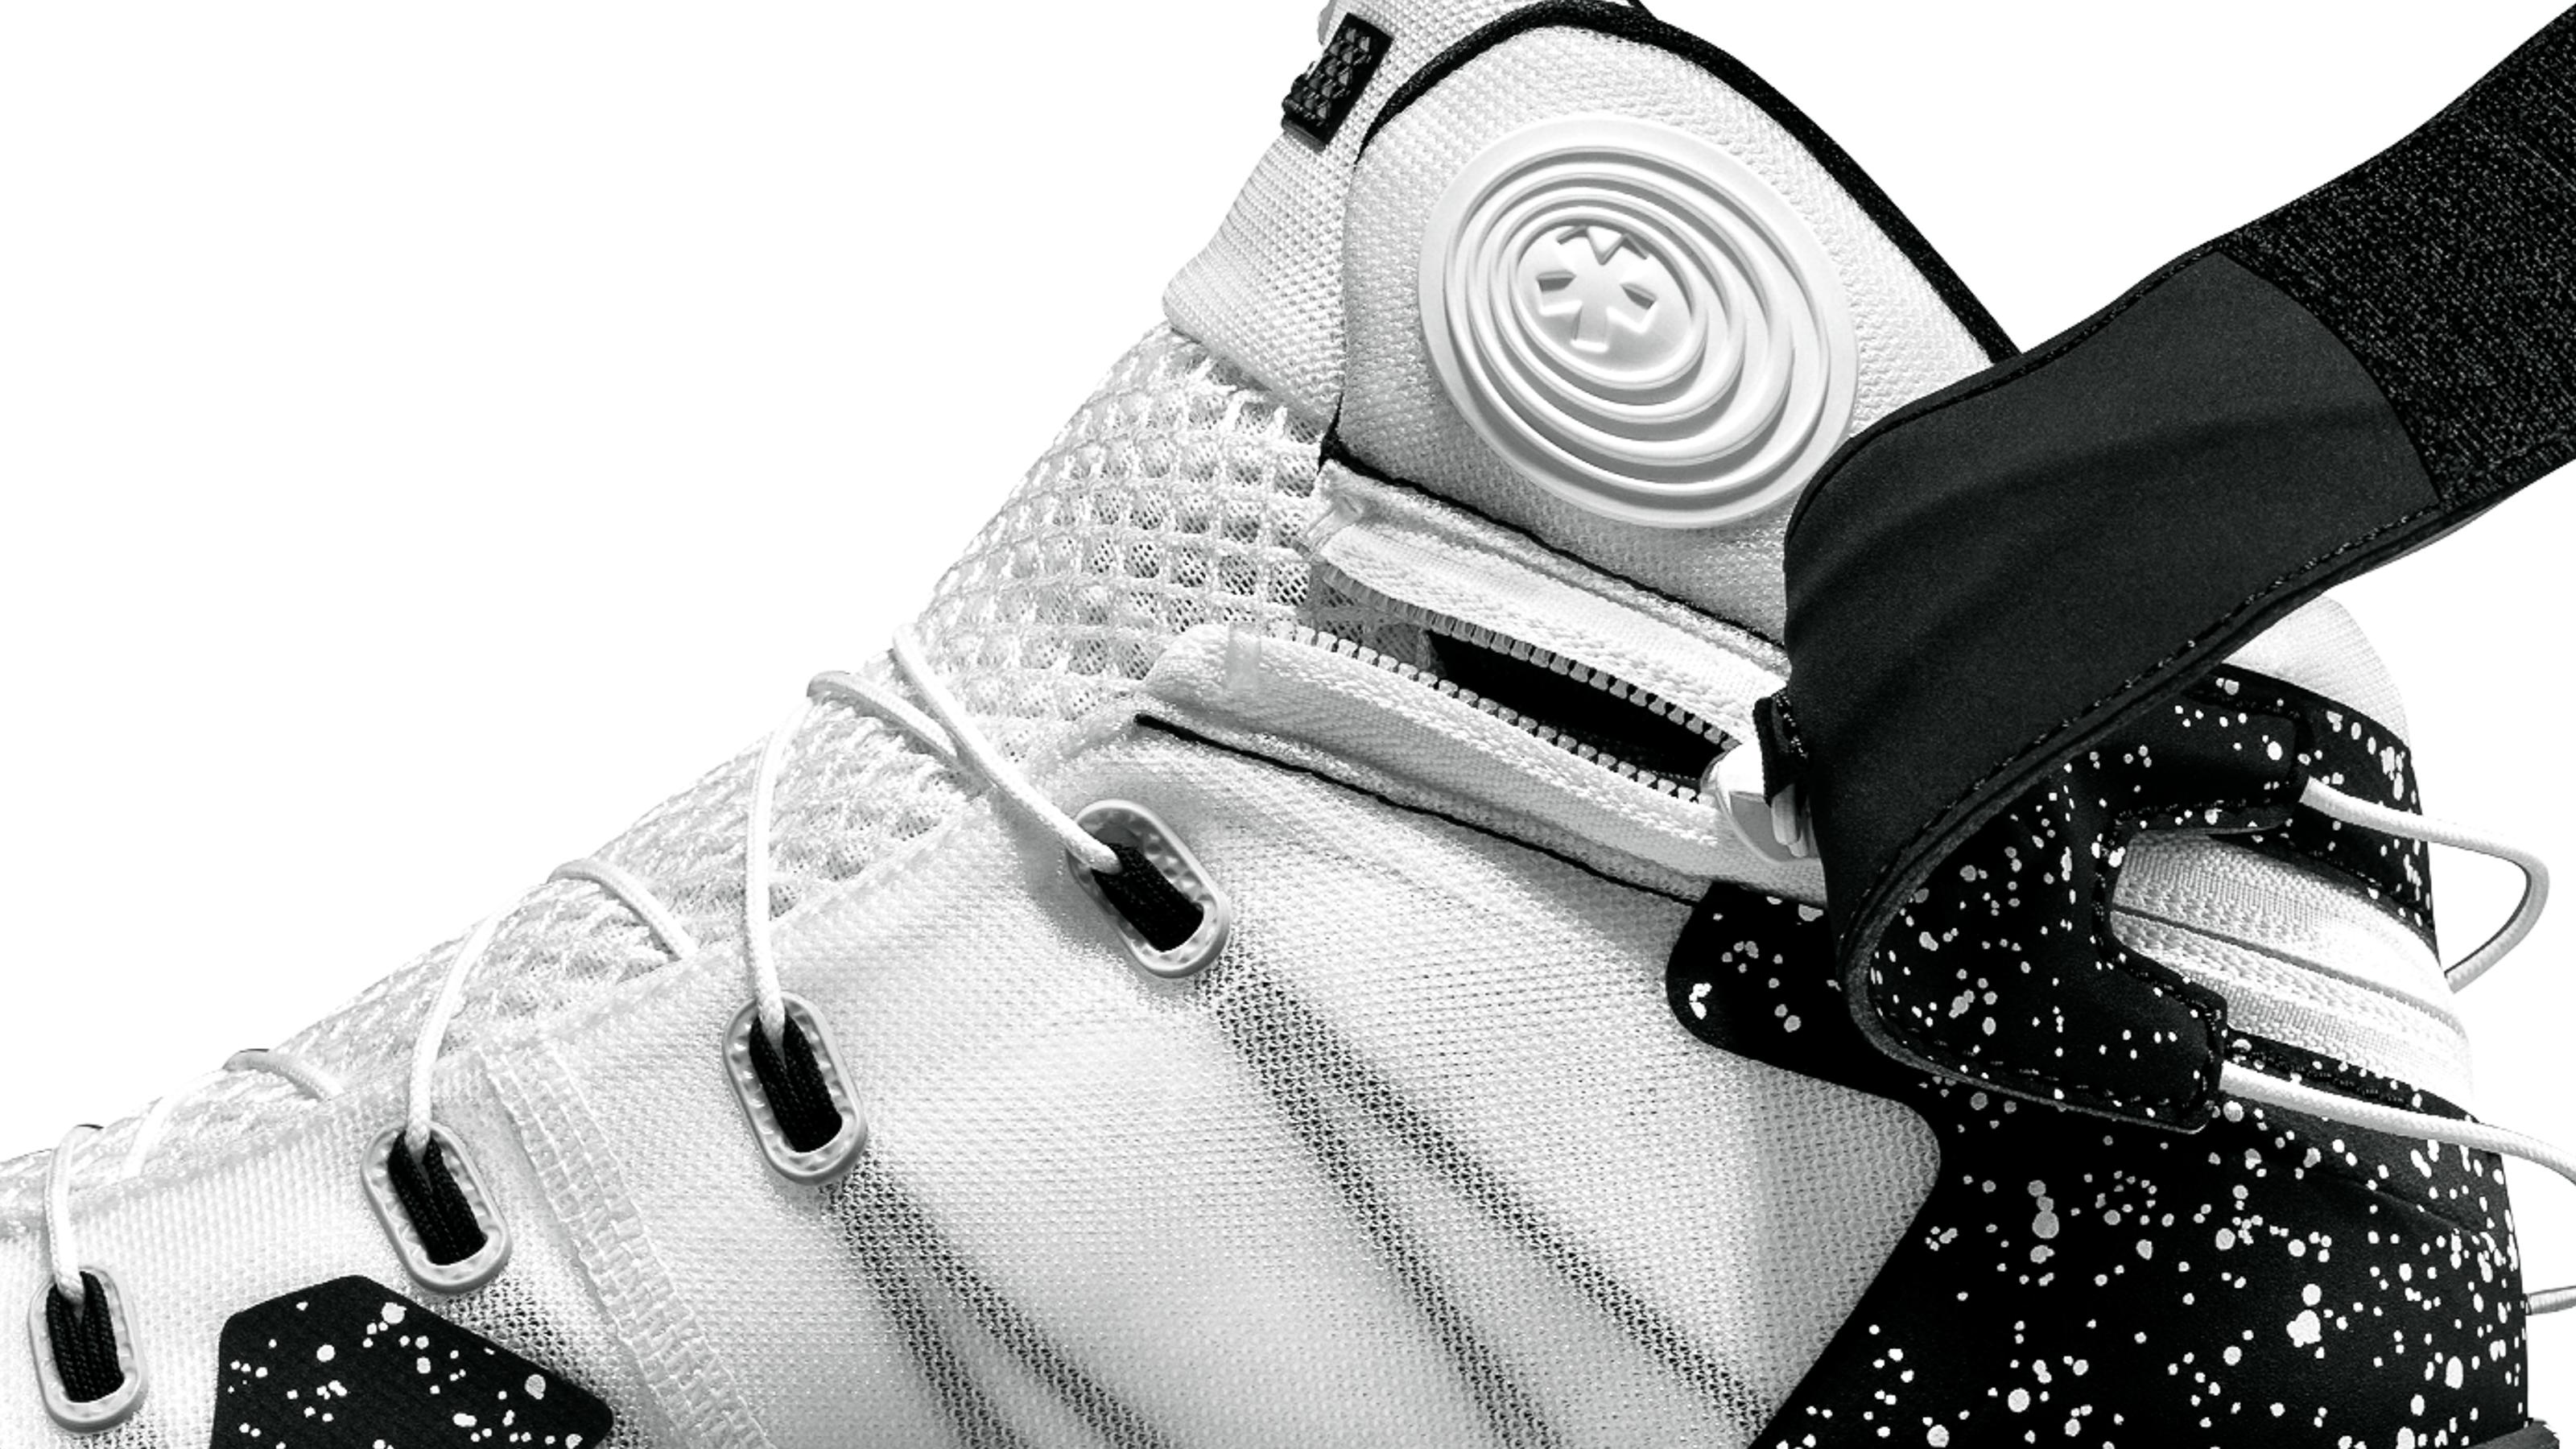 best service 4603e 3d543 Nike Flyease Archives - WearTesters